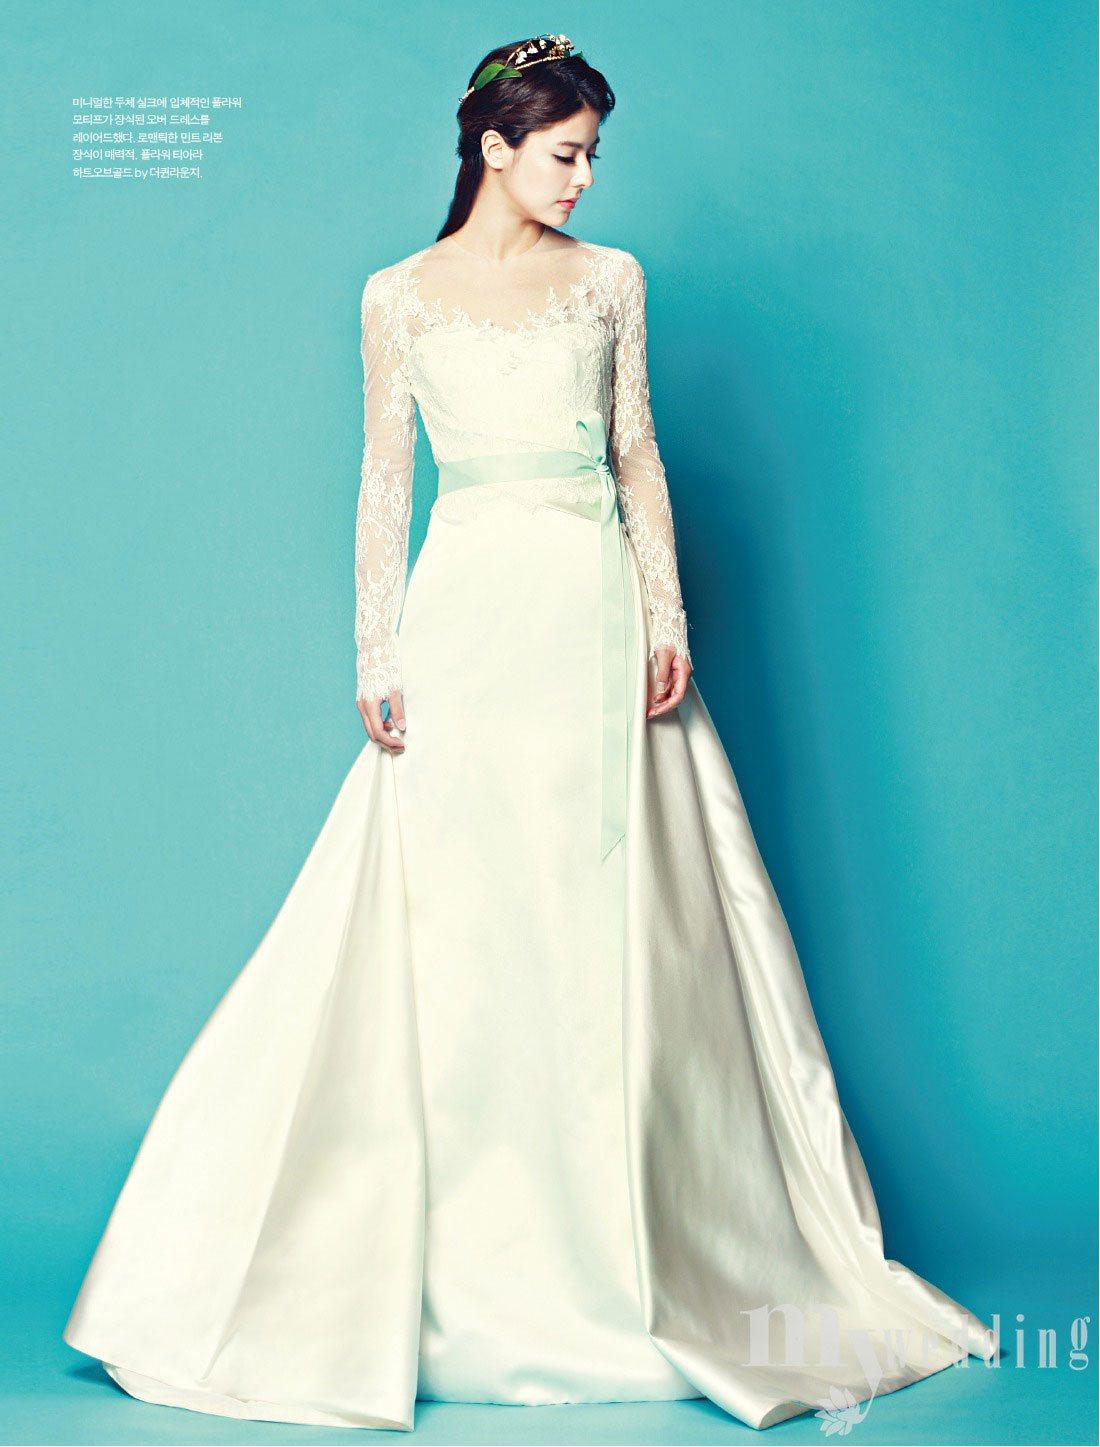 mina-fujii-wedding-magazine-5